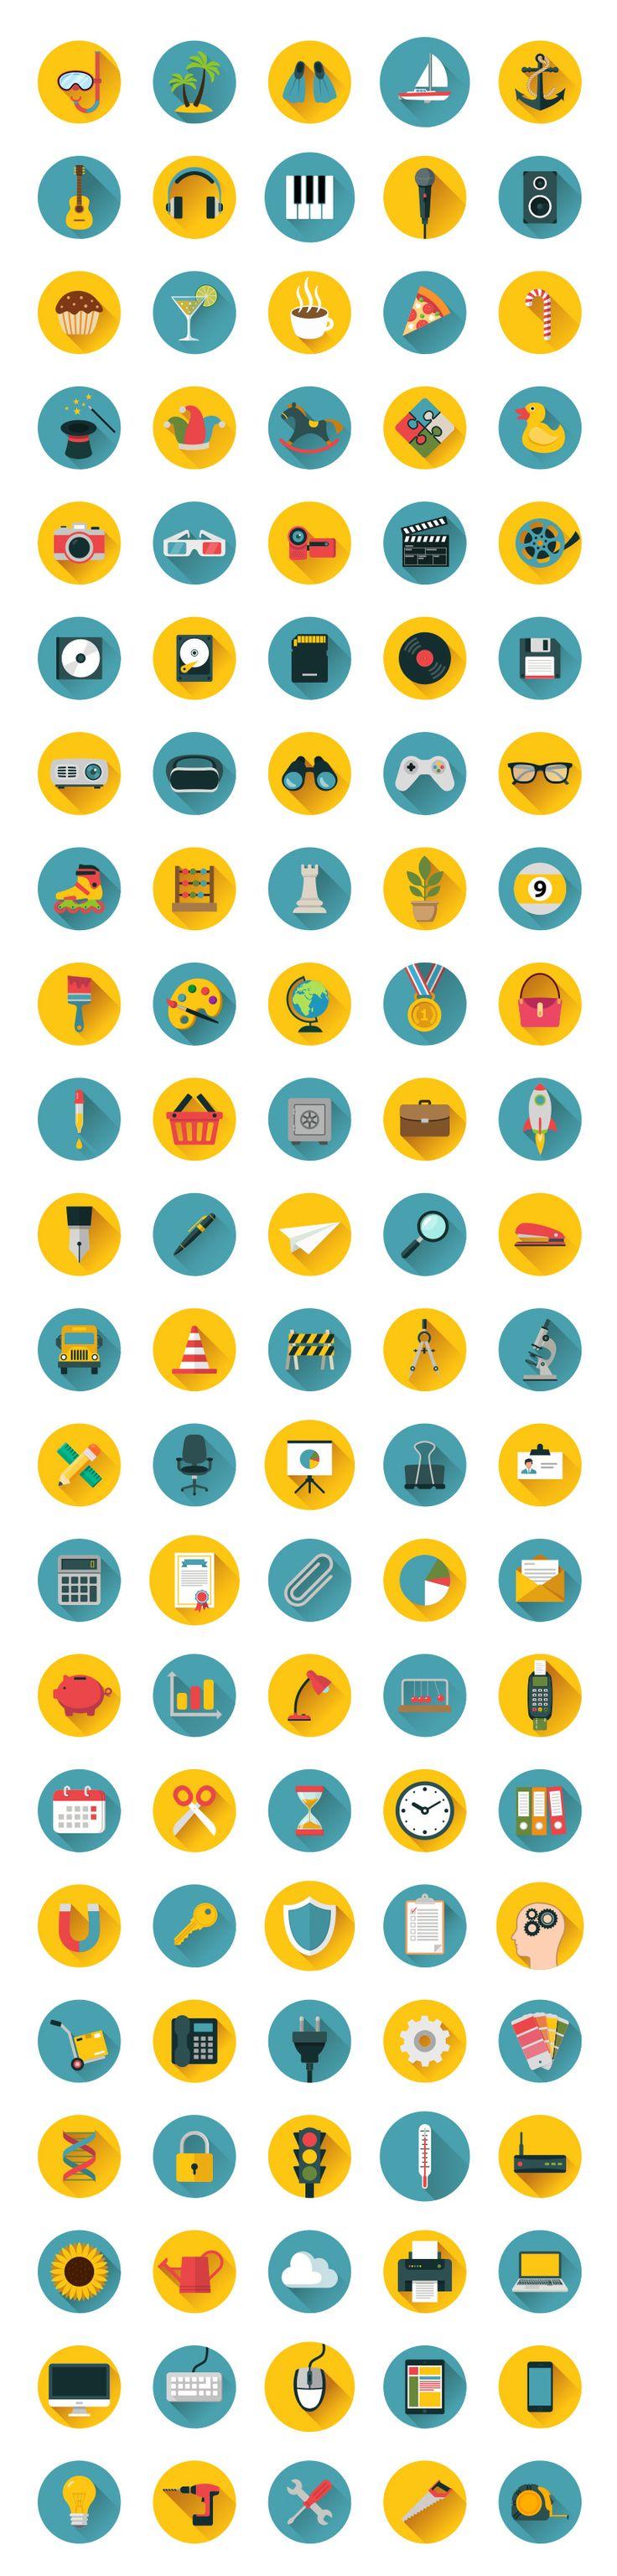 110 Flat Icons Bundle